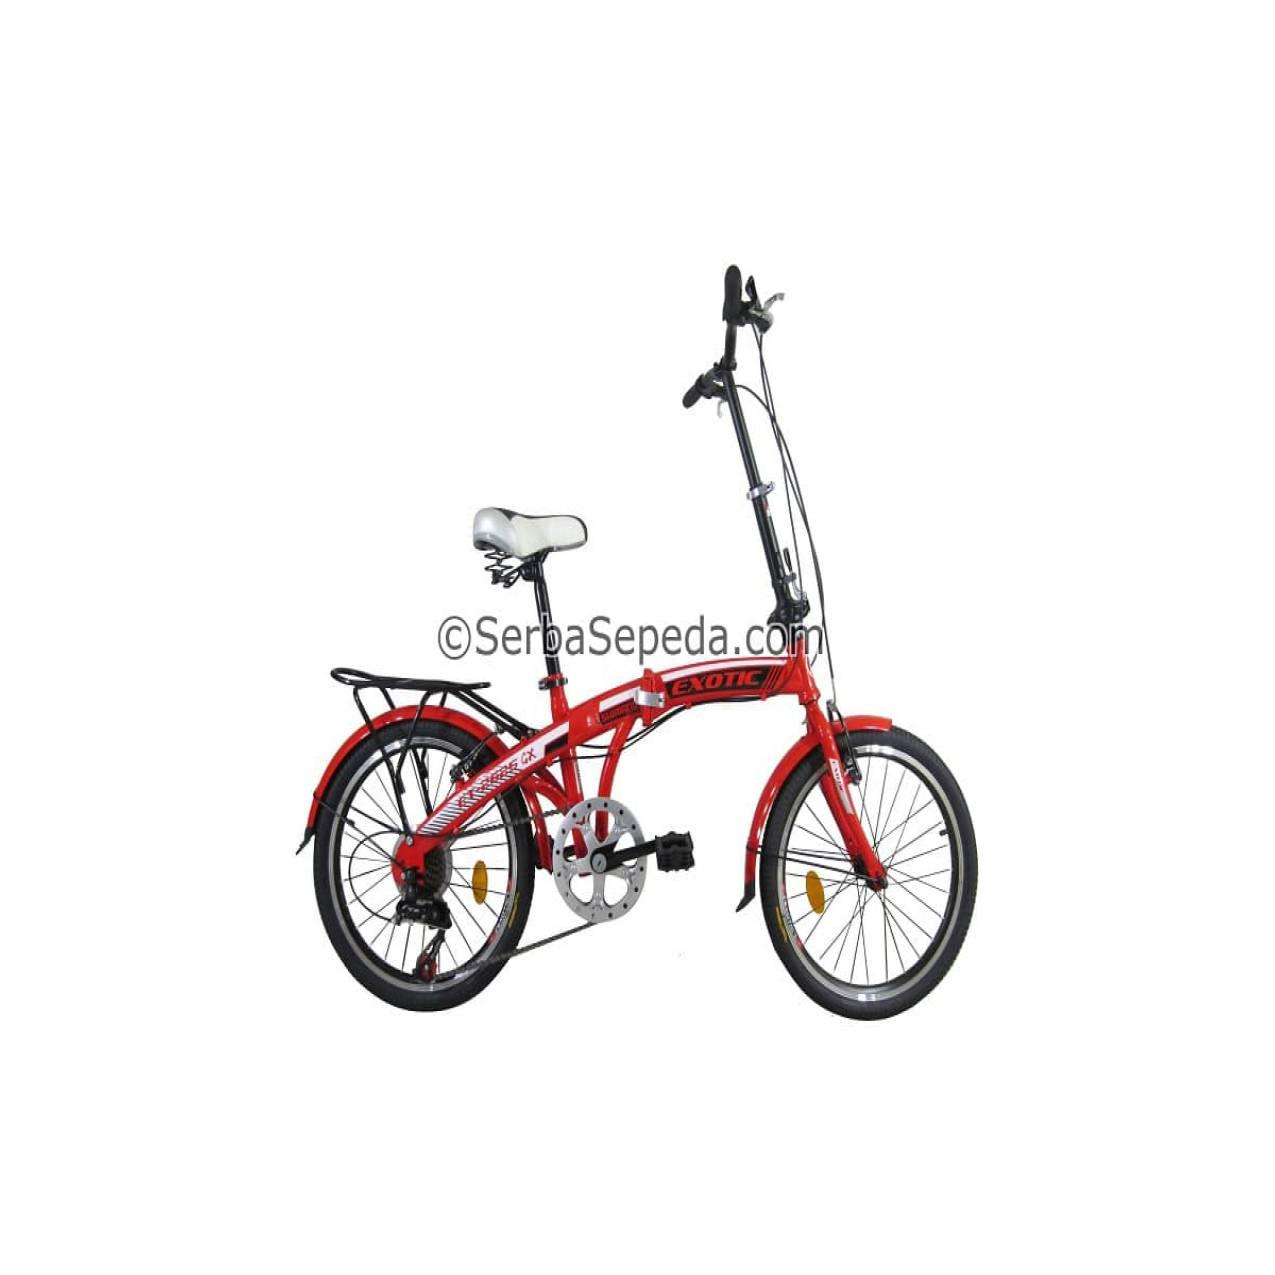 Sepeda Lipat Exotic 20 ET 2625 GX